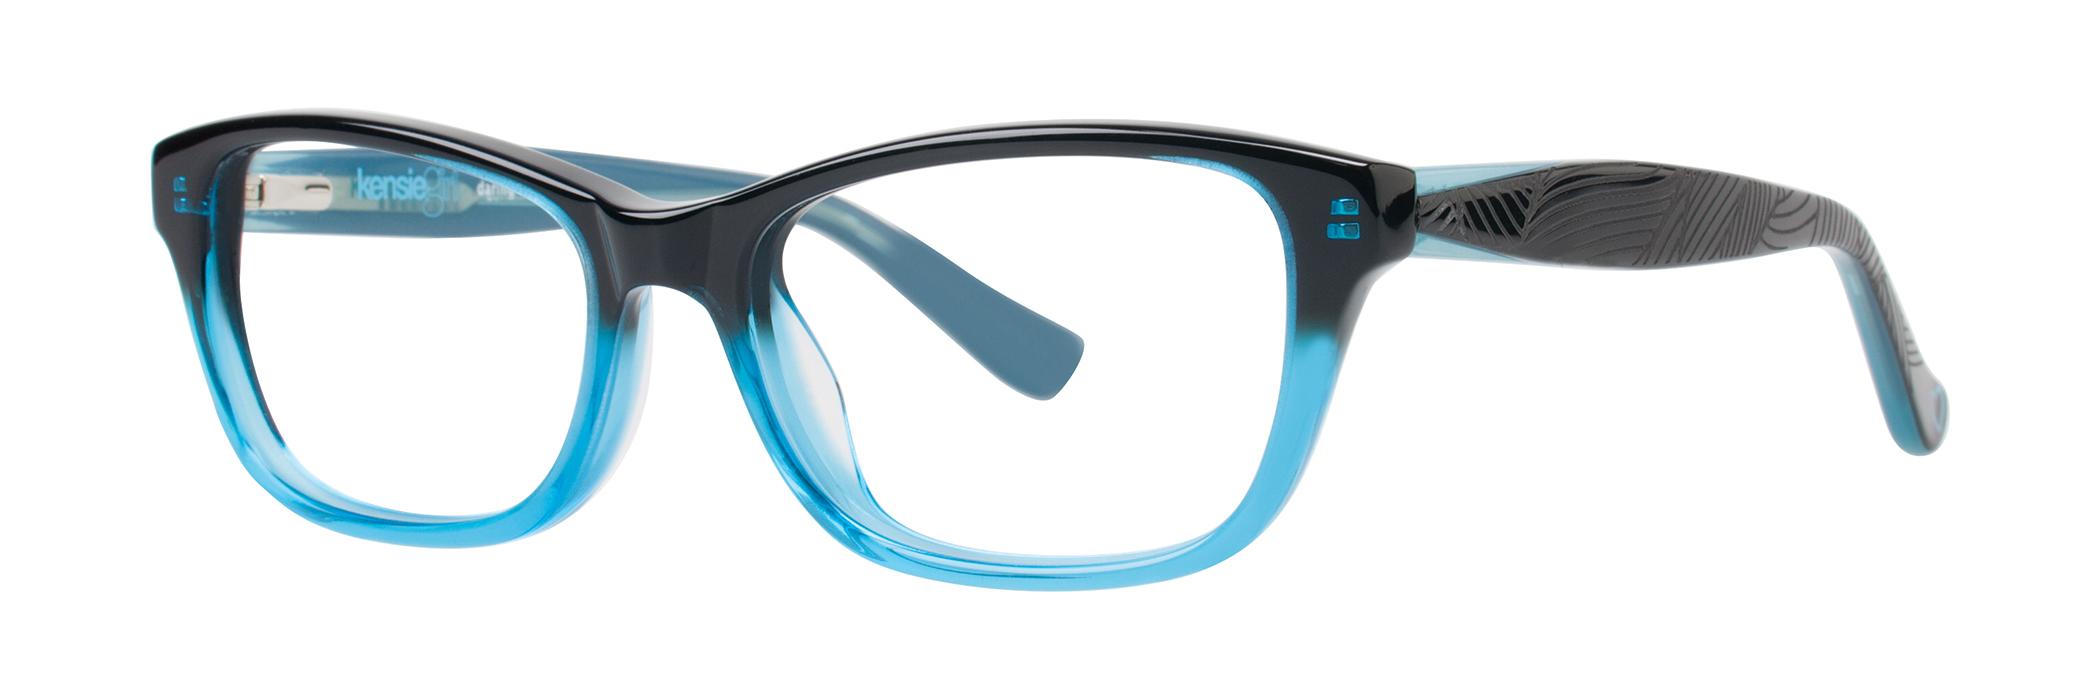 f8450c1b810 Eyewear for Kids - 8-10 years - Optiwow